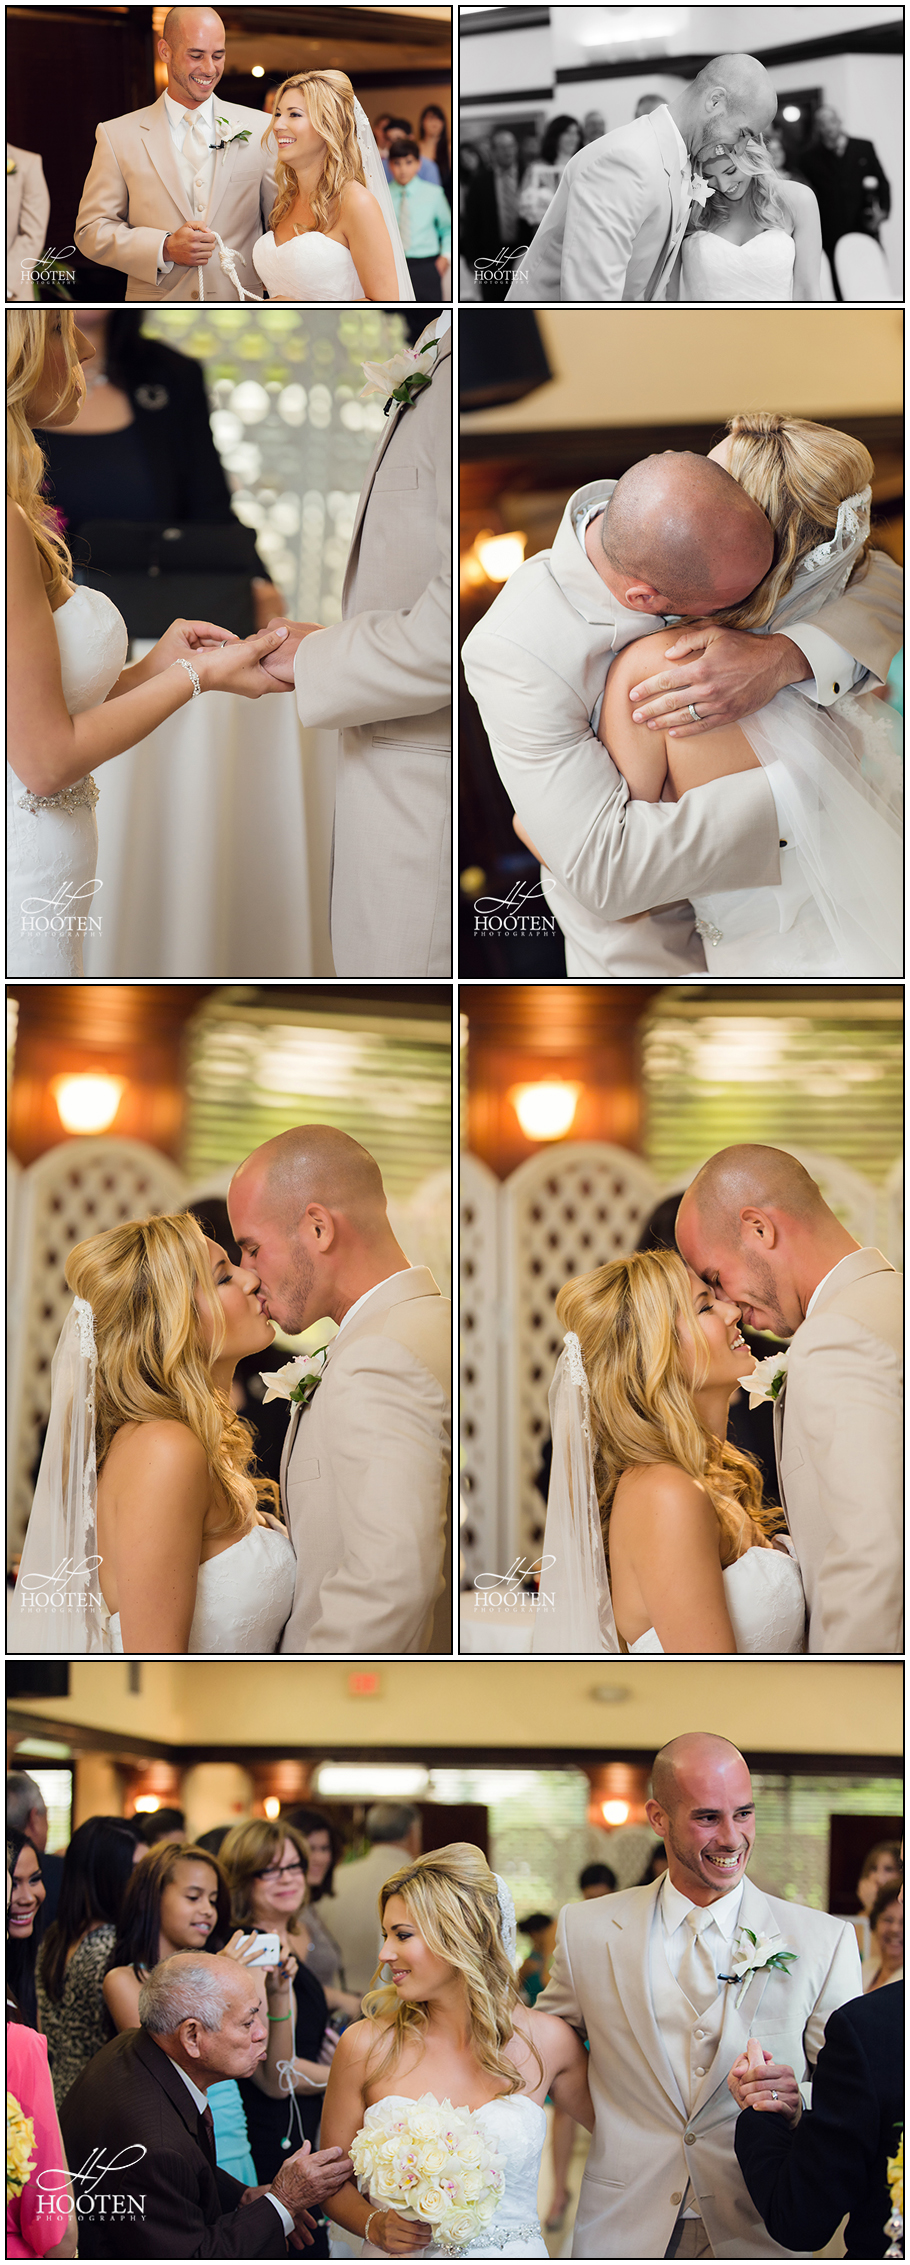 Hooten-Photography-Miami-Wedding-Photography-Rodriguez-Photo-5.jpg